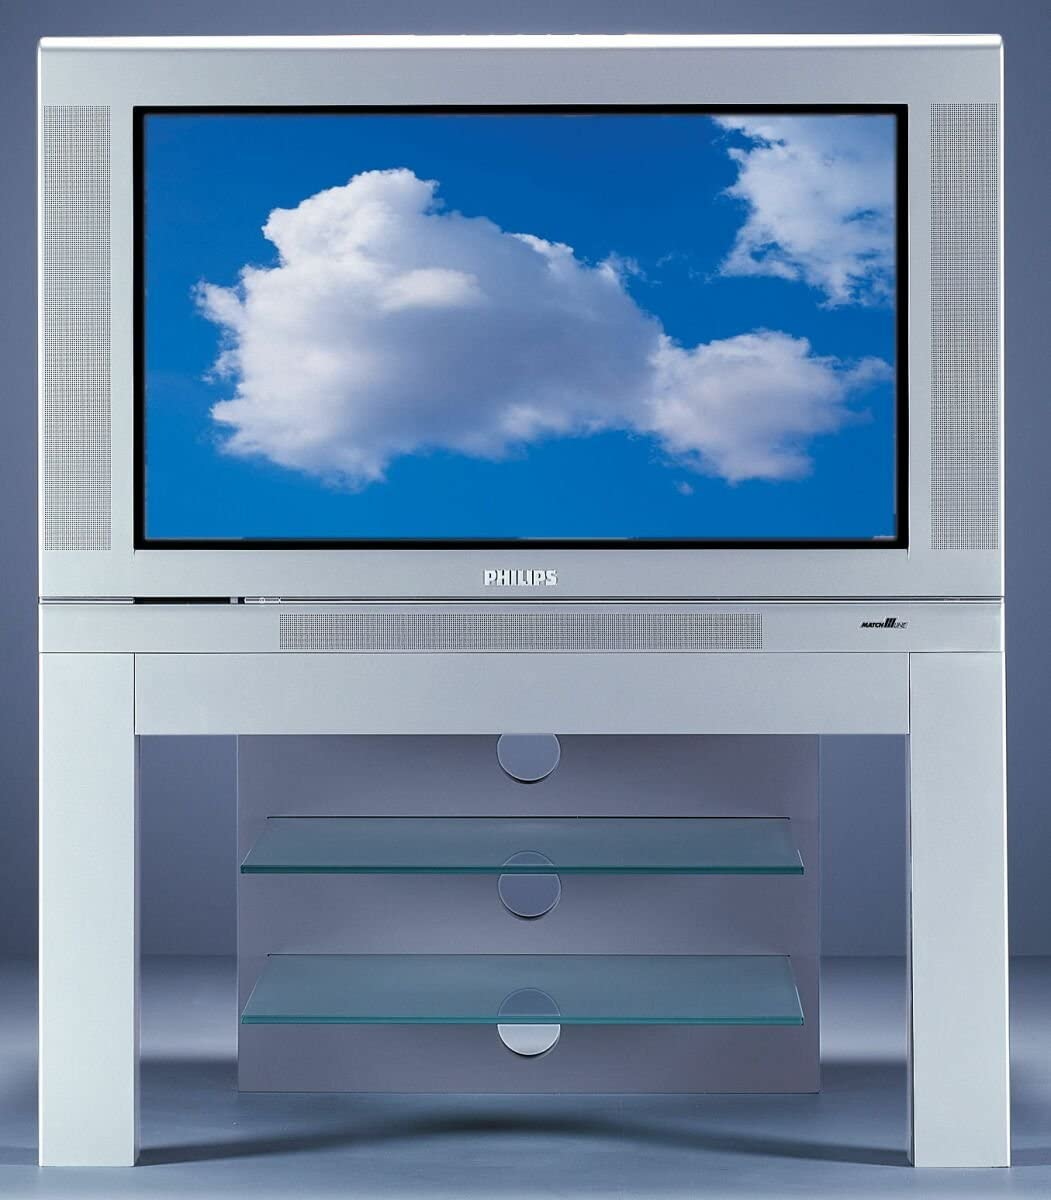 Philips 32 PW 9768 16: 9 Formato 100 Hertz televisor Precision ...